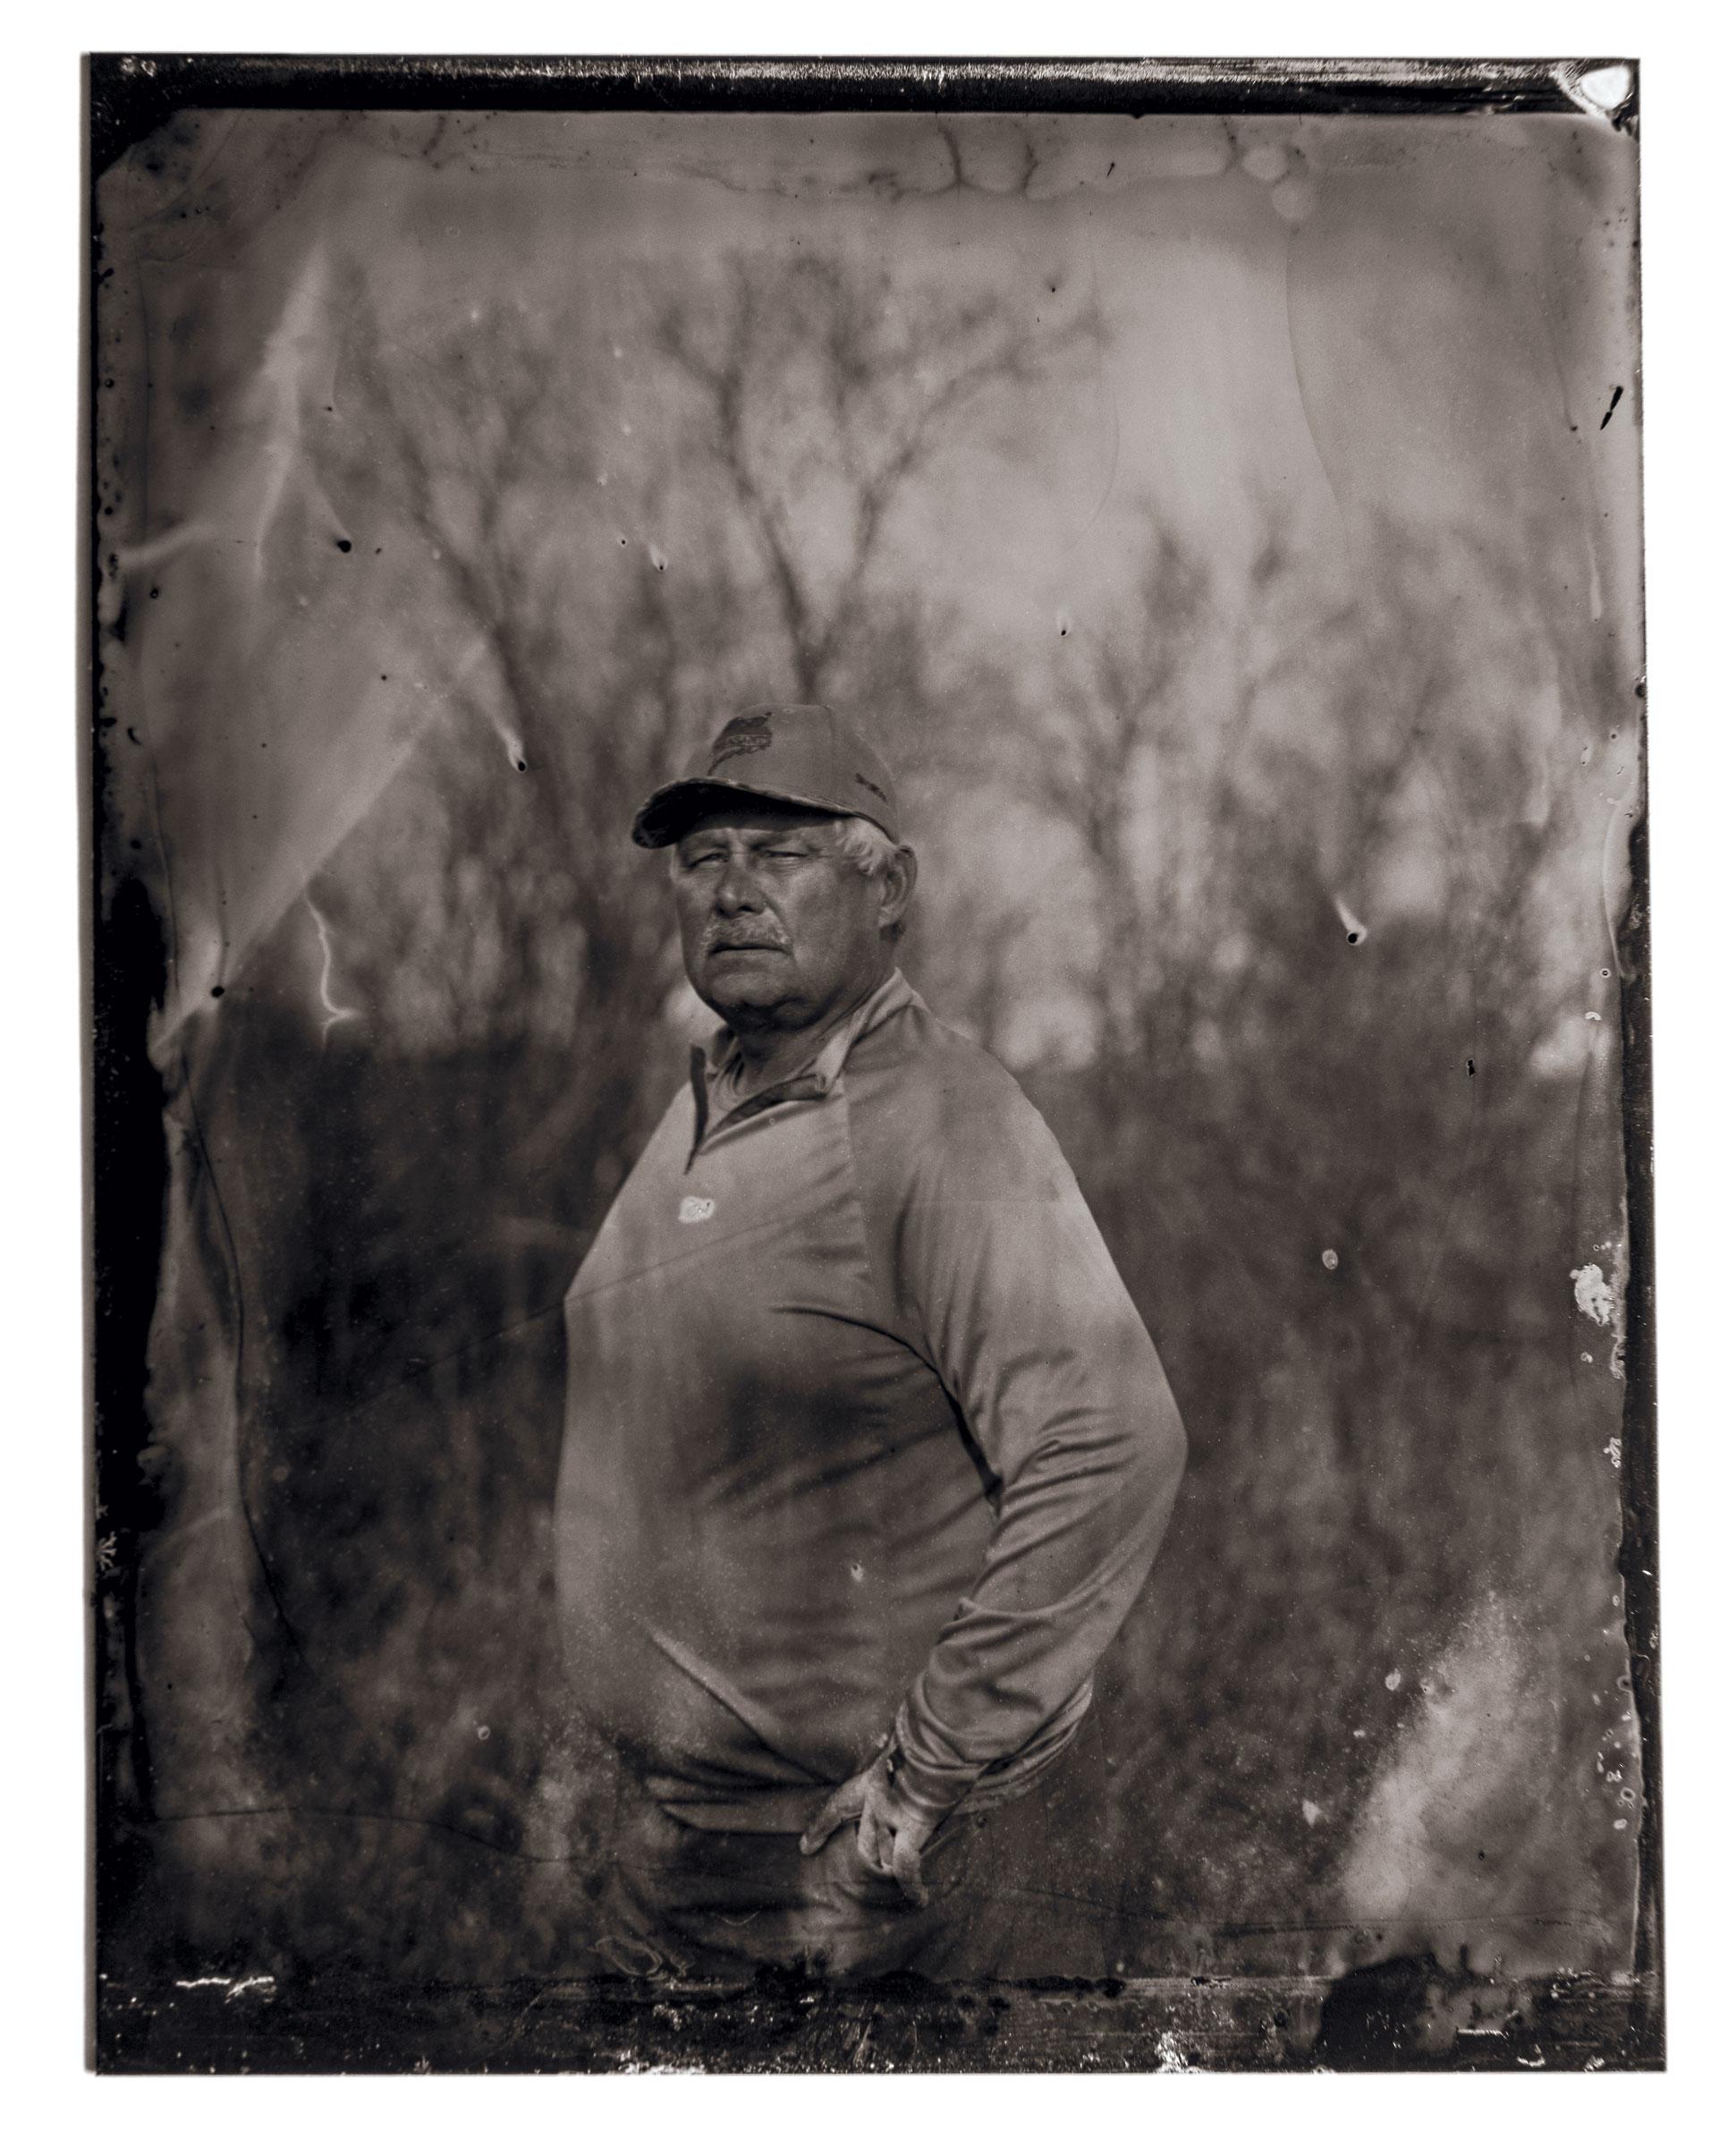 Paul Niebur on his pheasant property just outside of Redfield, South Dakota. Tom Fowlks